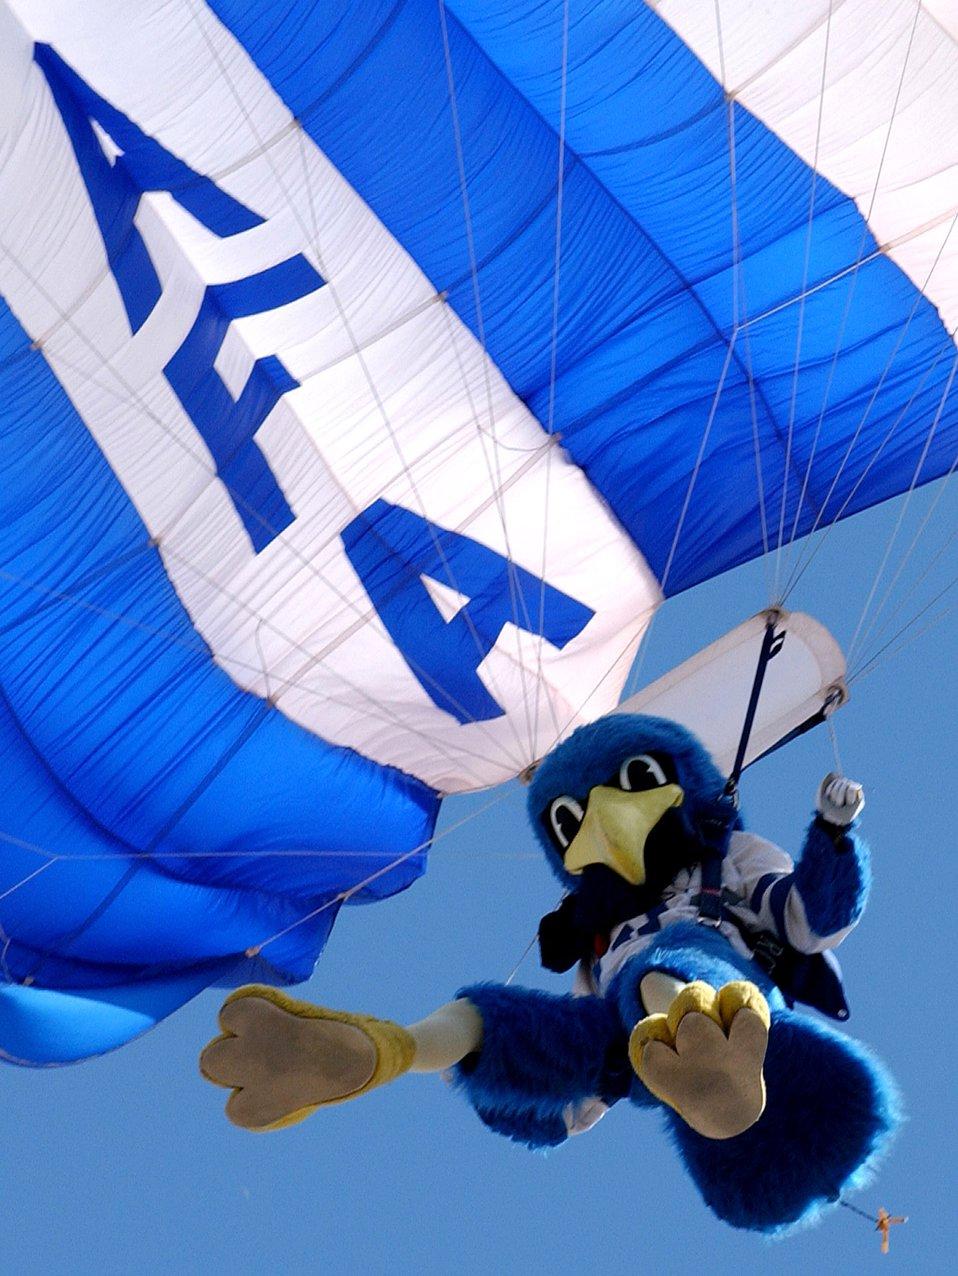 Falcon mascot competes again